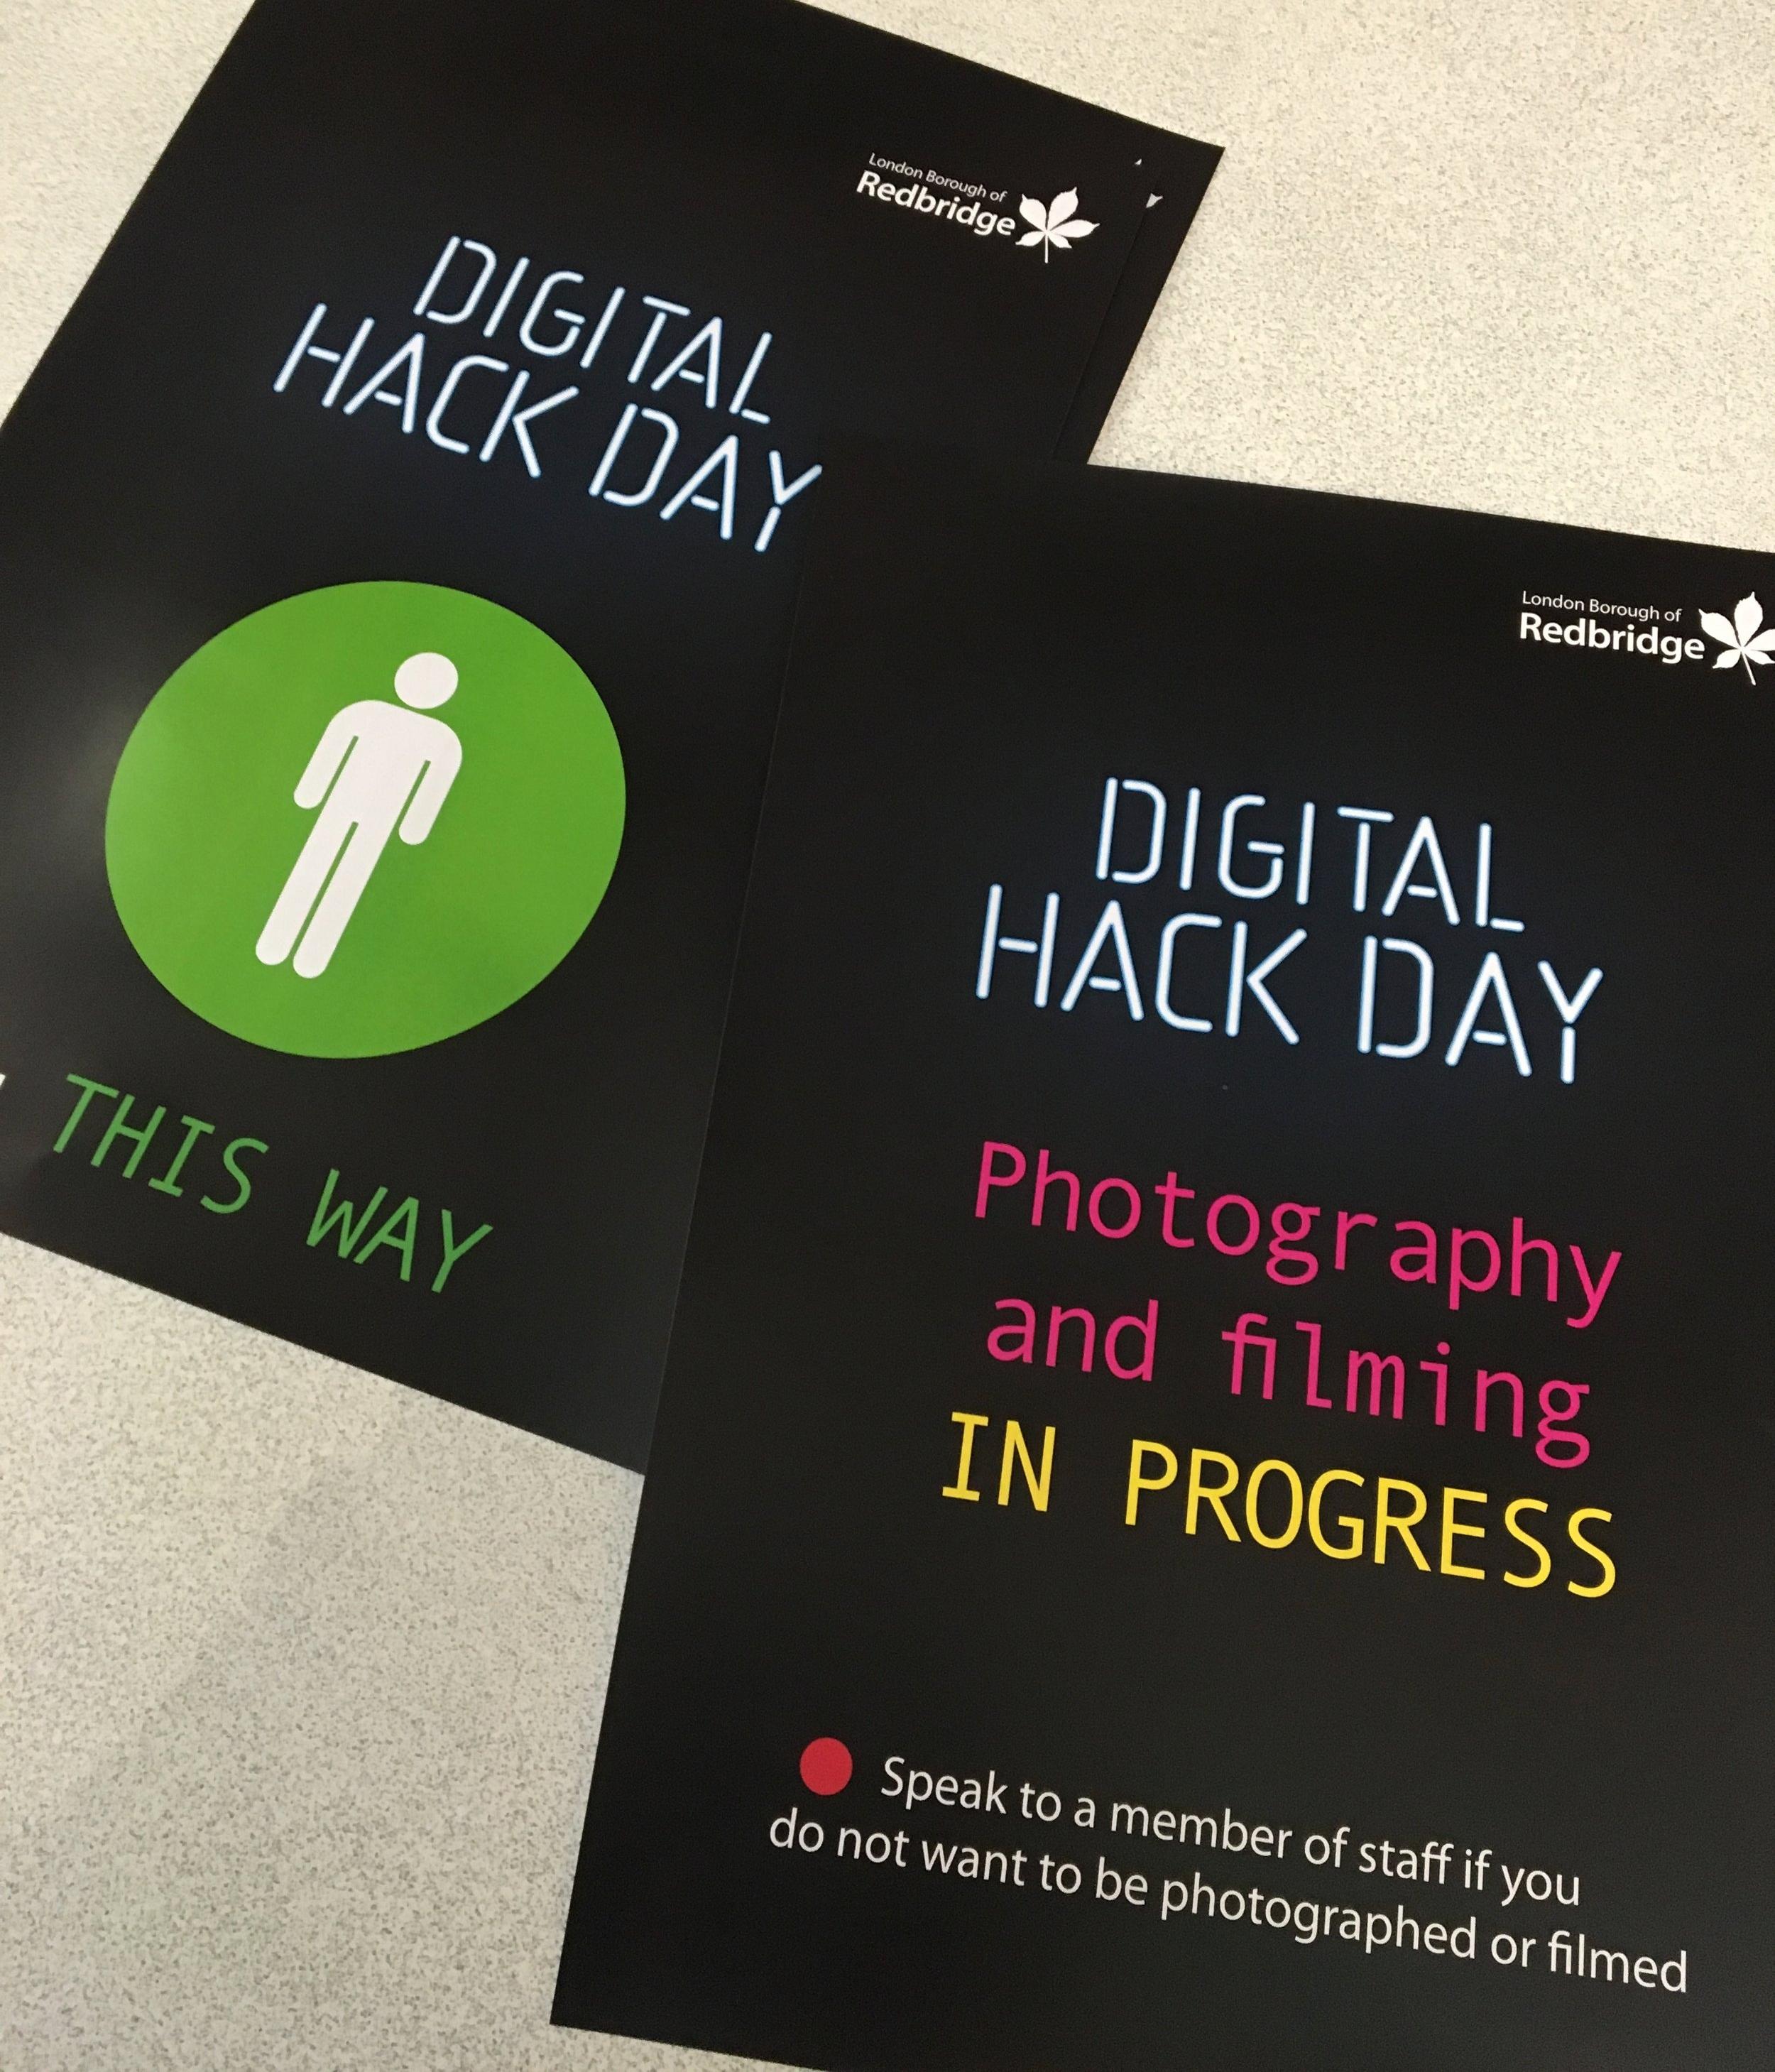 BirdsongConsultancy_Digital_Hack_Day_Posters.jpg